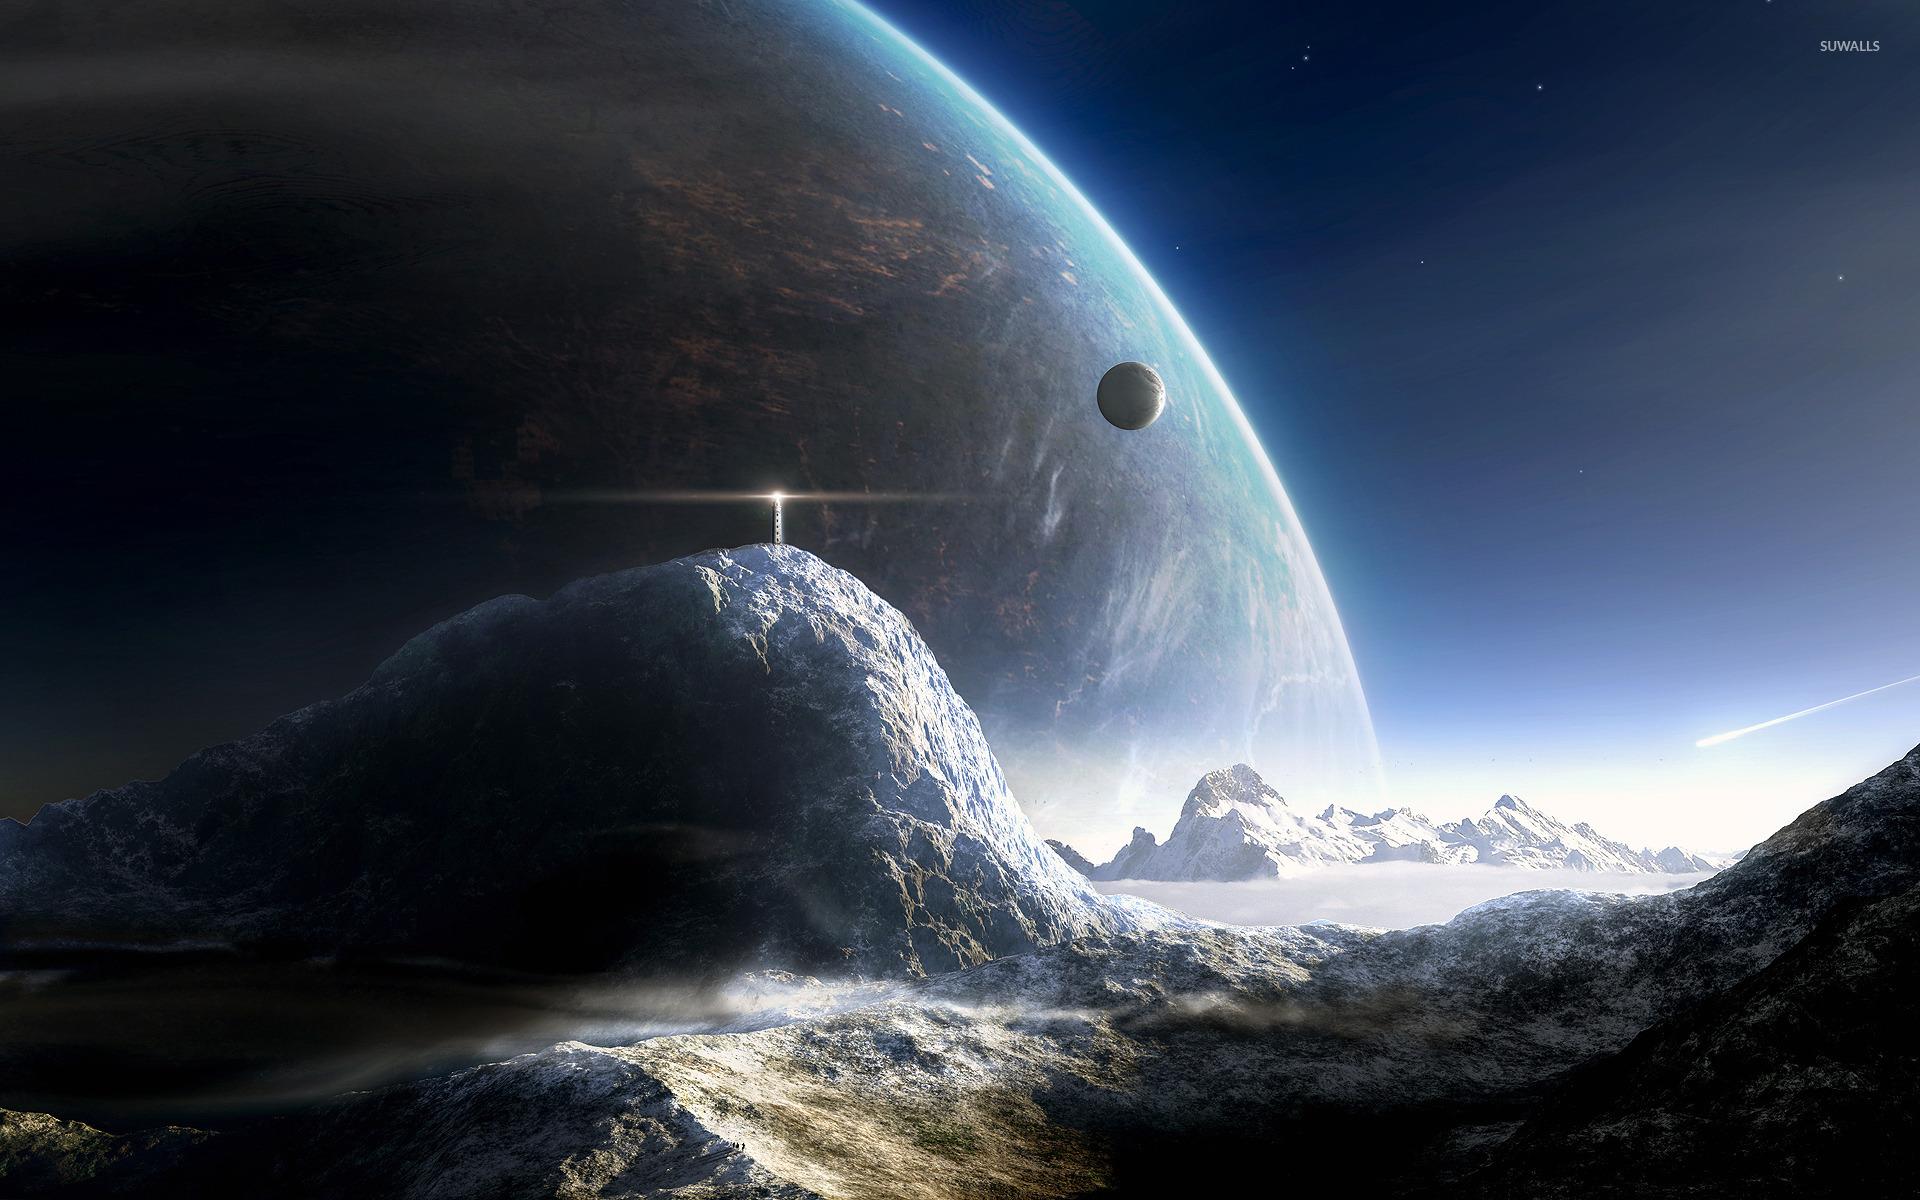 Lifgthouse on a distant planet wallpaper   Fantasy 1920x1200